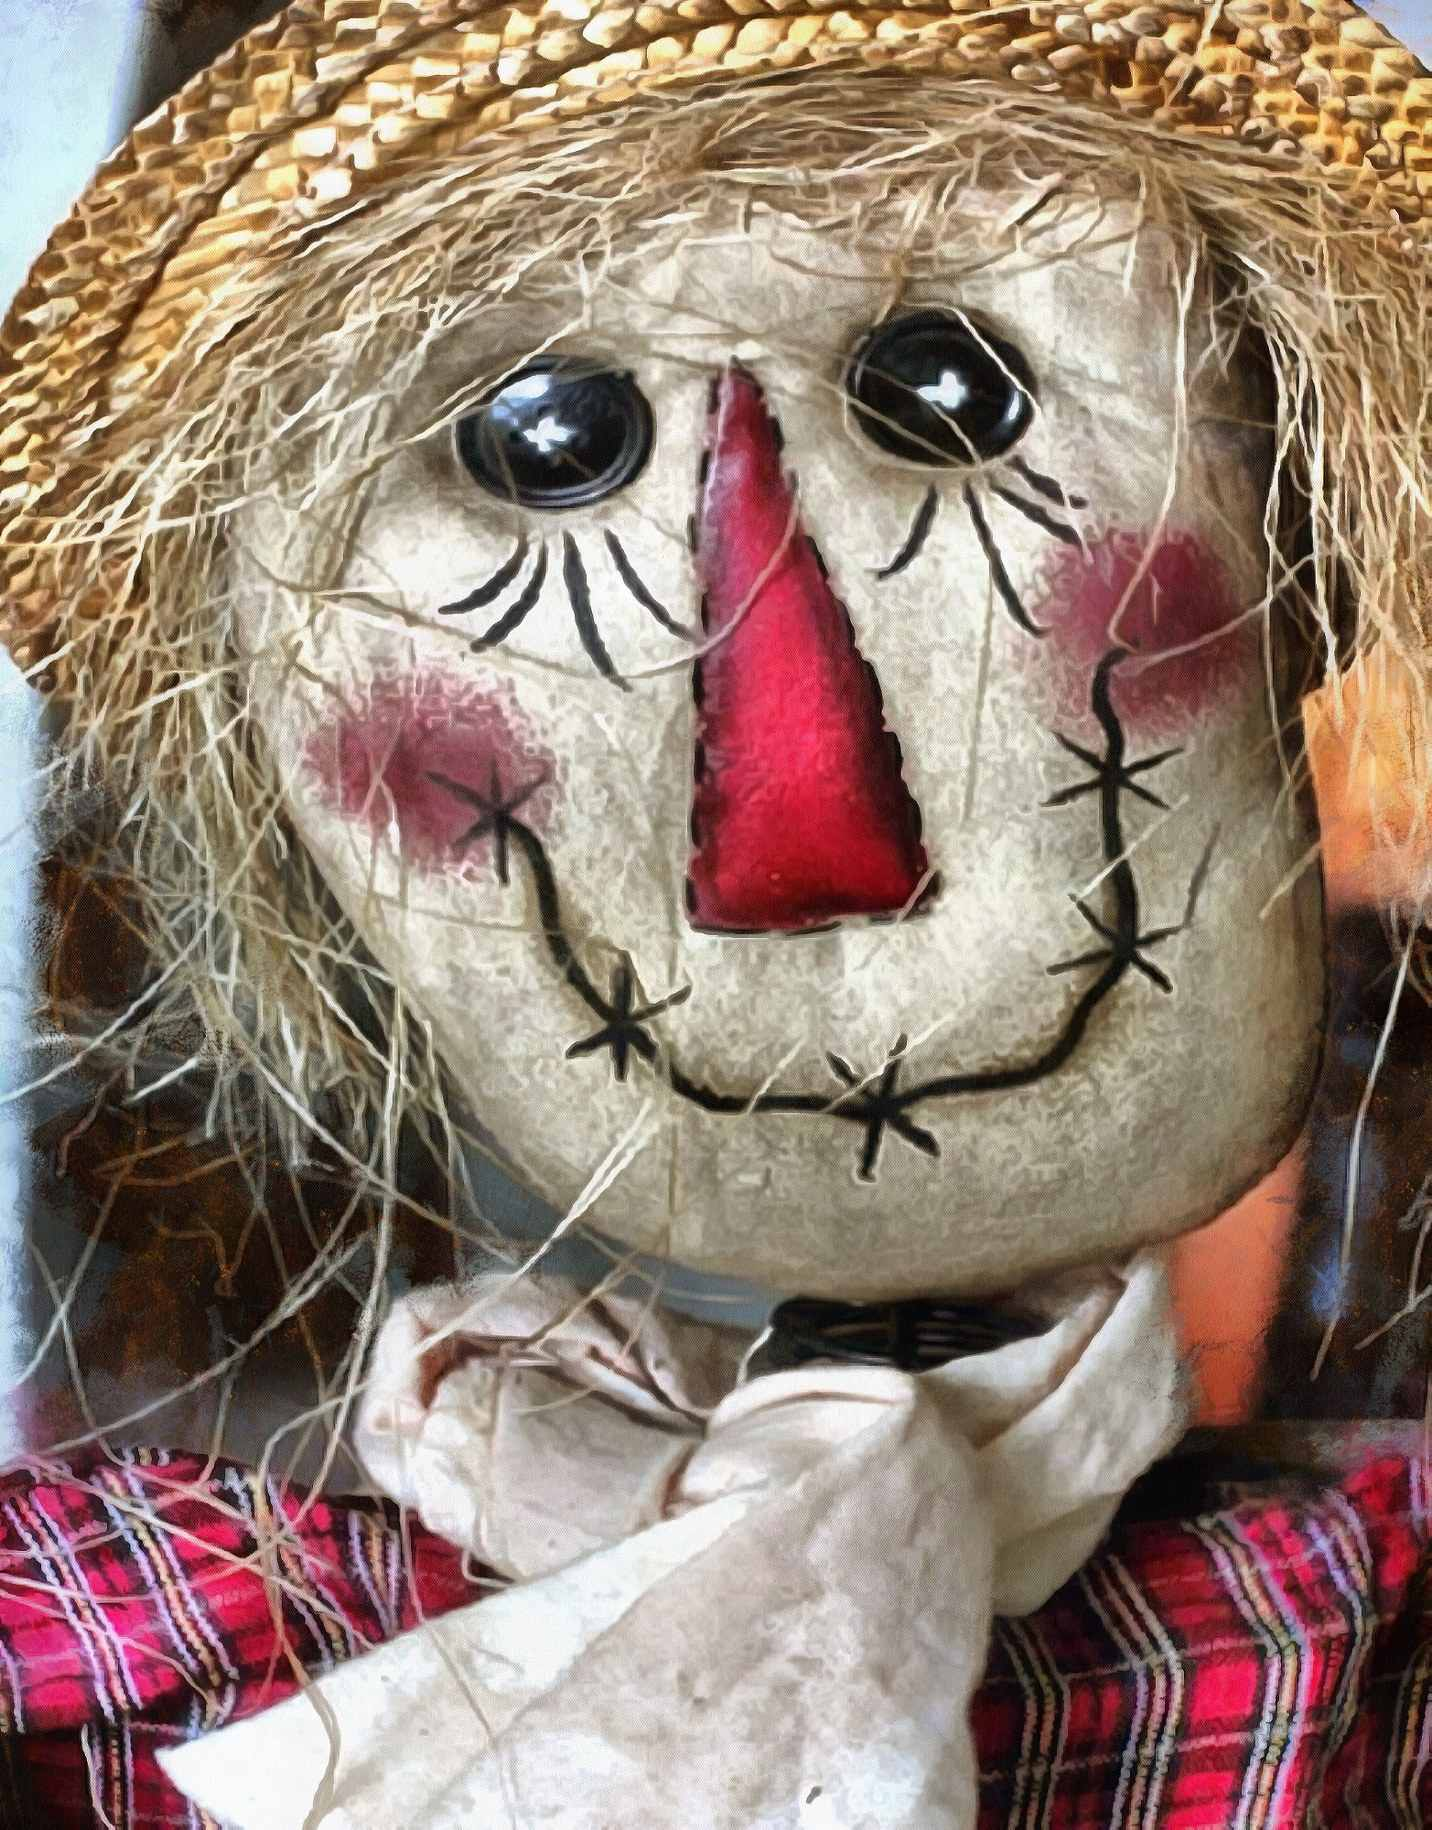 front face, doll, unhappy face, toy, scarecrow,